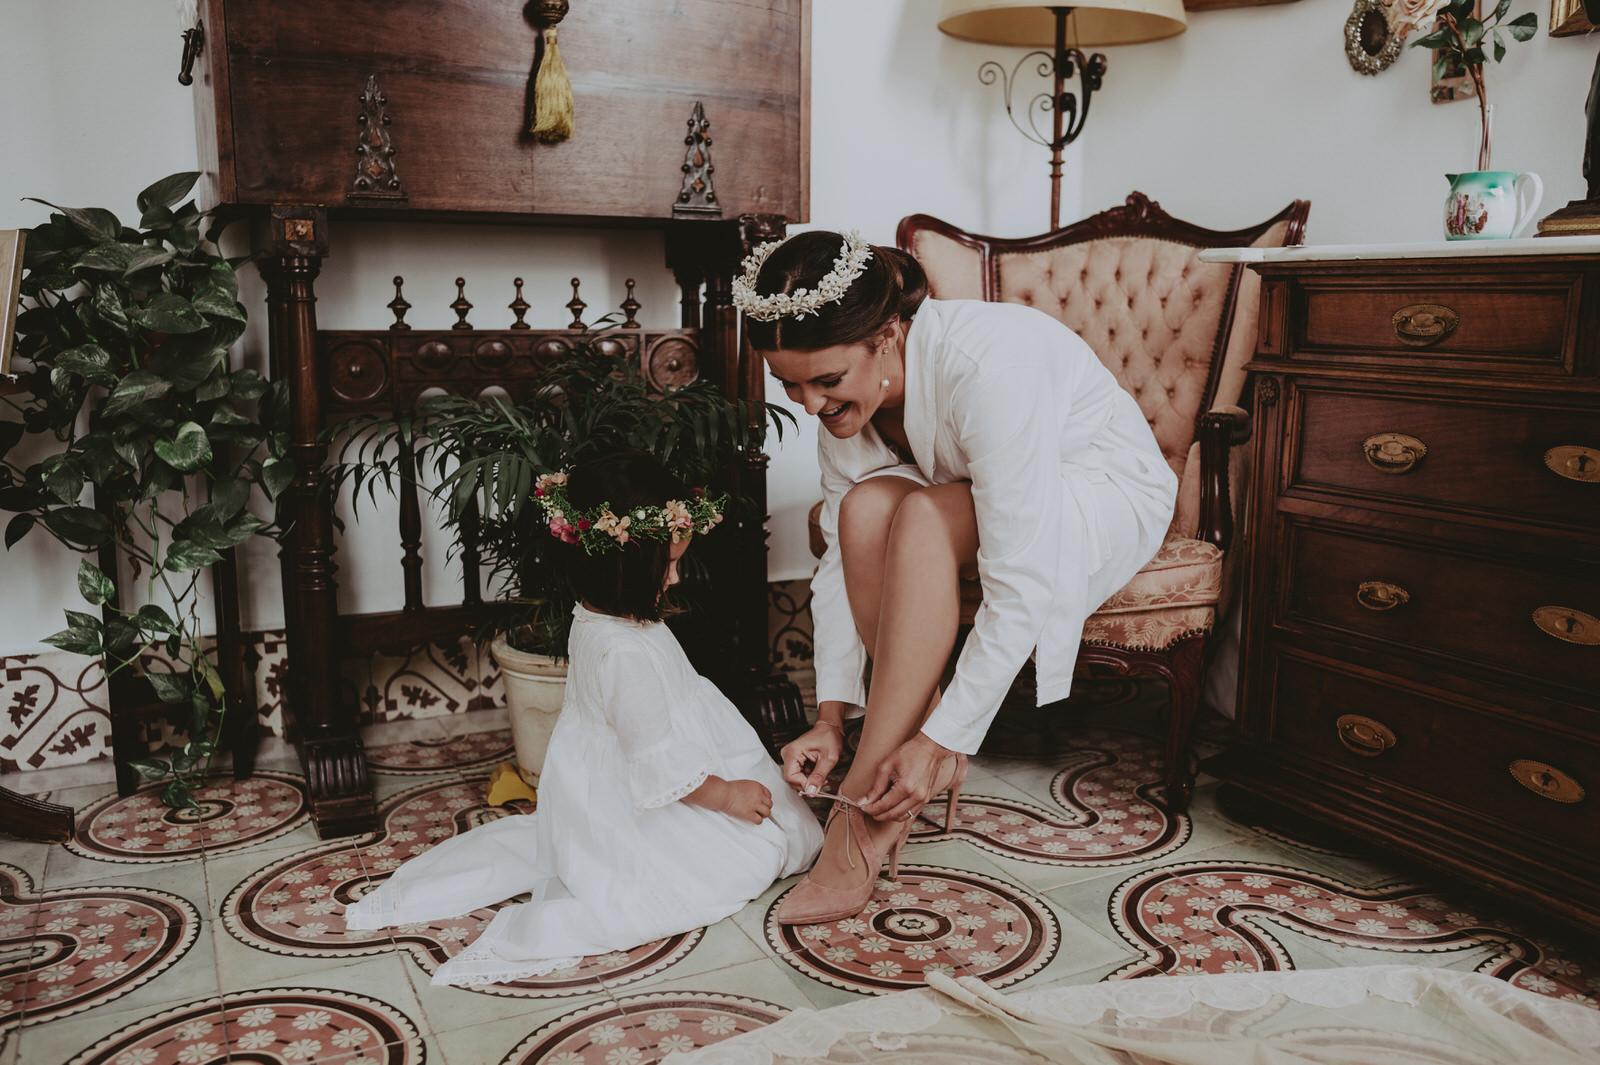 Judith & Gabriel - Boda en Olivares - Albaida, Fotógrafo de boda Andrés Amarillo - 51.jpg